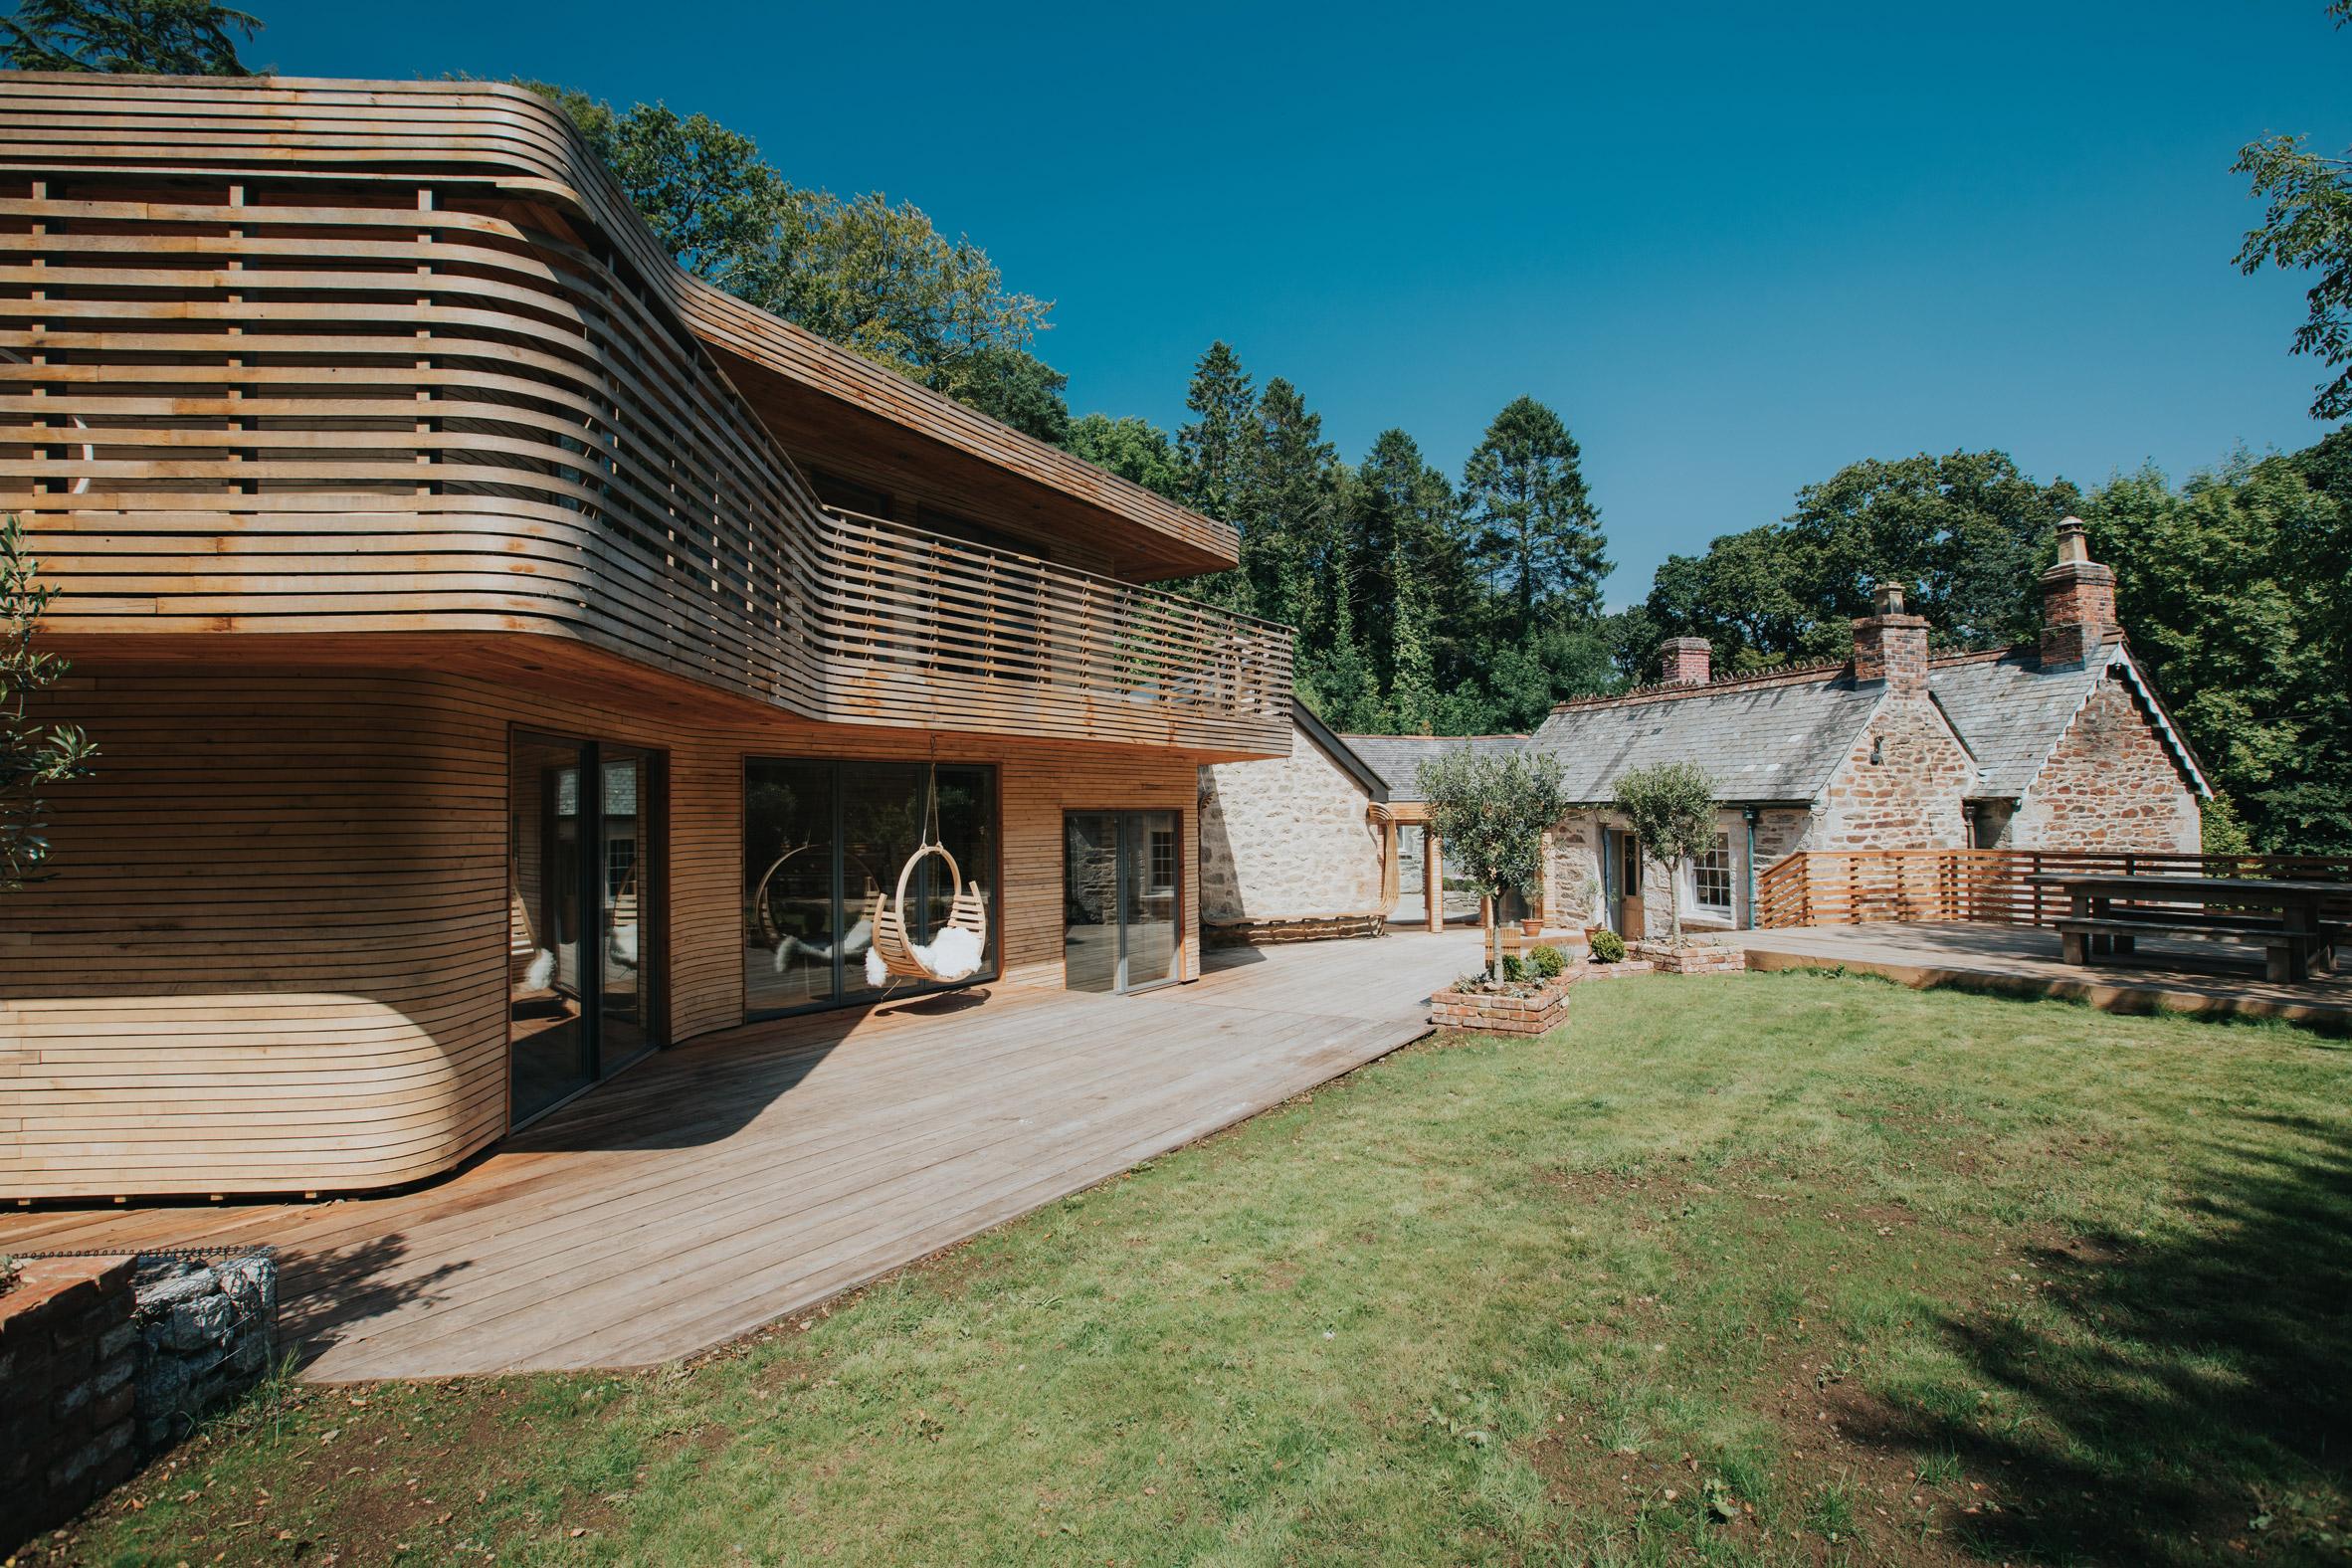 steam-bent-house-tom-raffield-architecture-residential_dezeen_2364_col_0.jpg